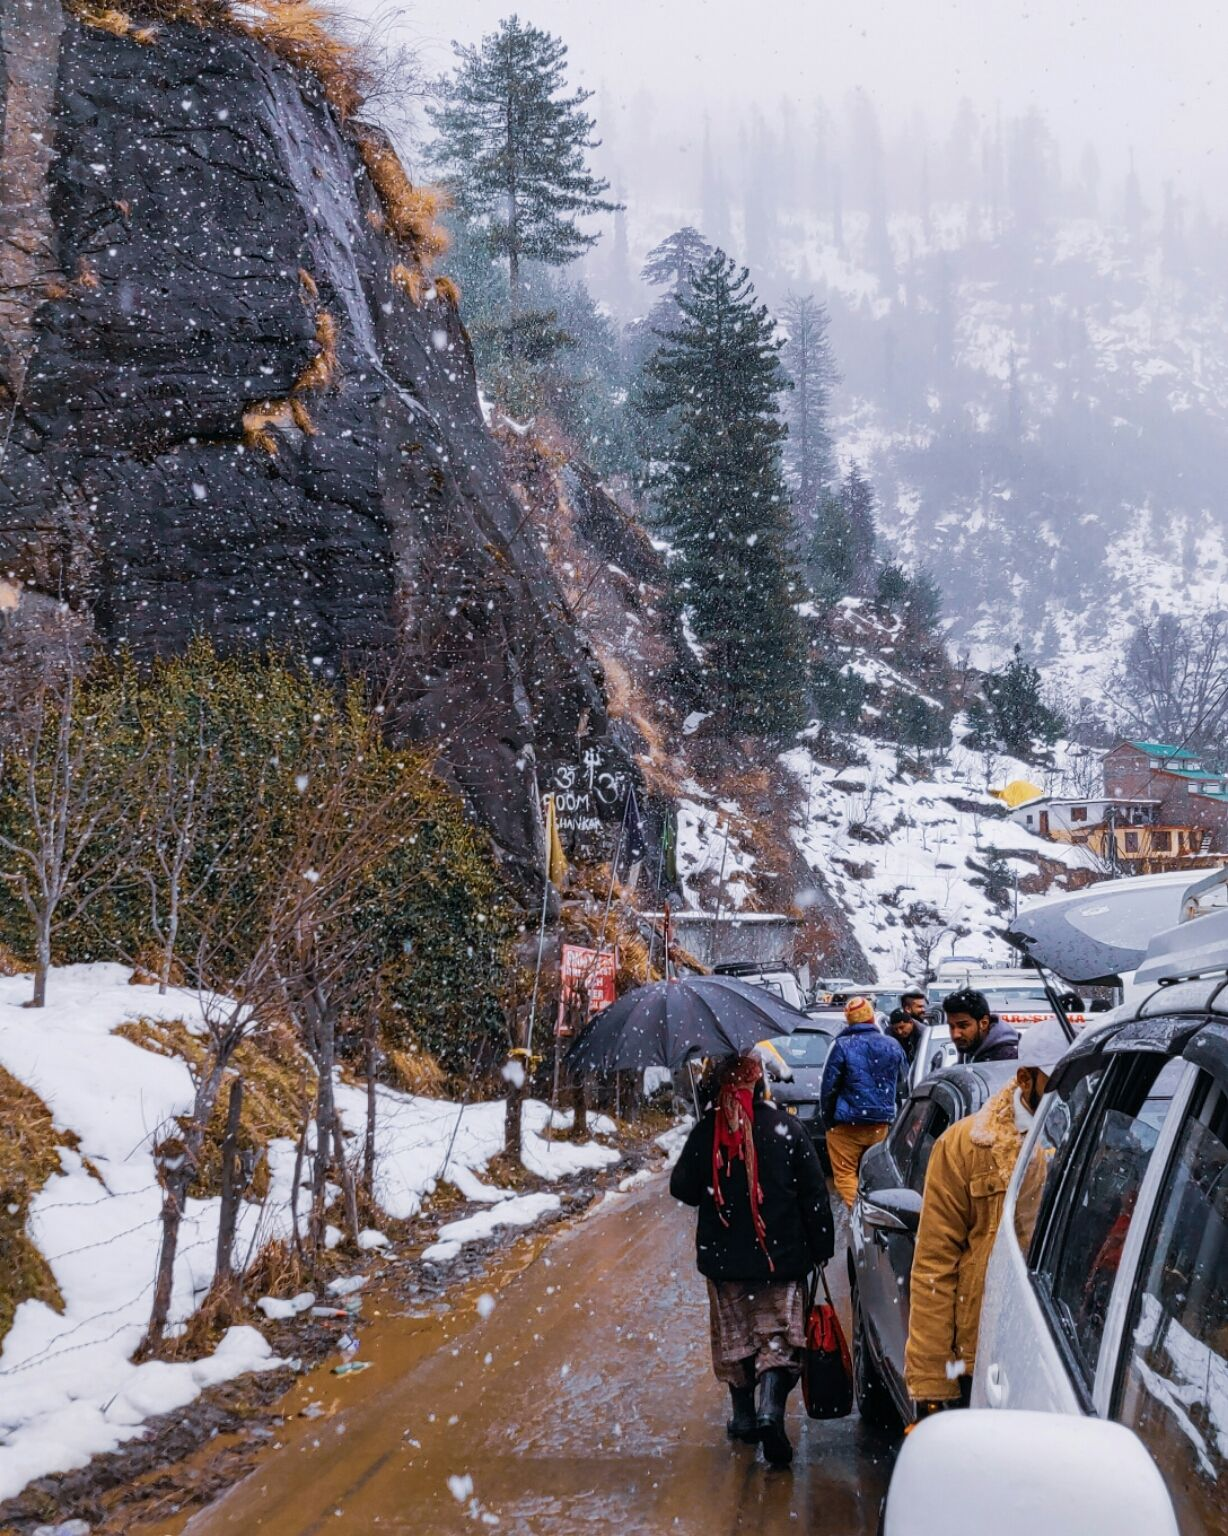 Photo of Himachal Pradesh By atul patil